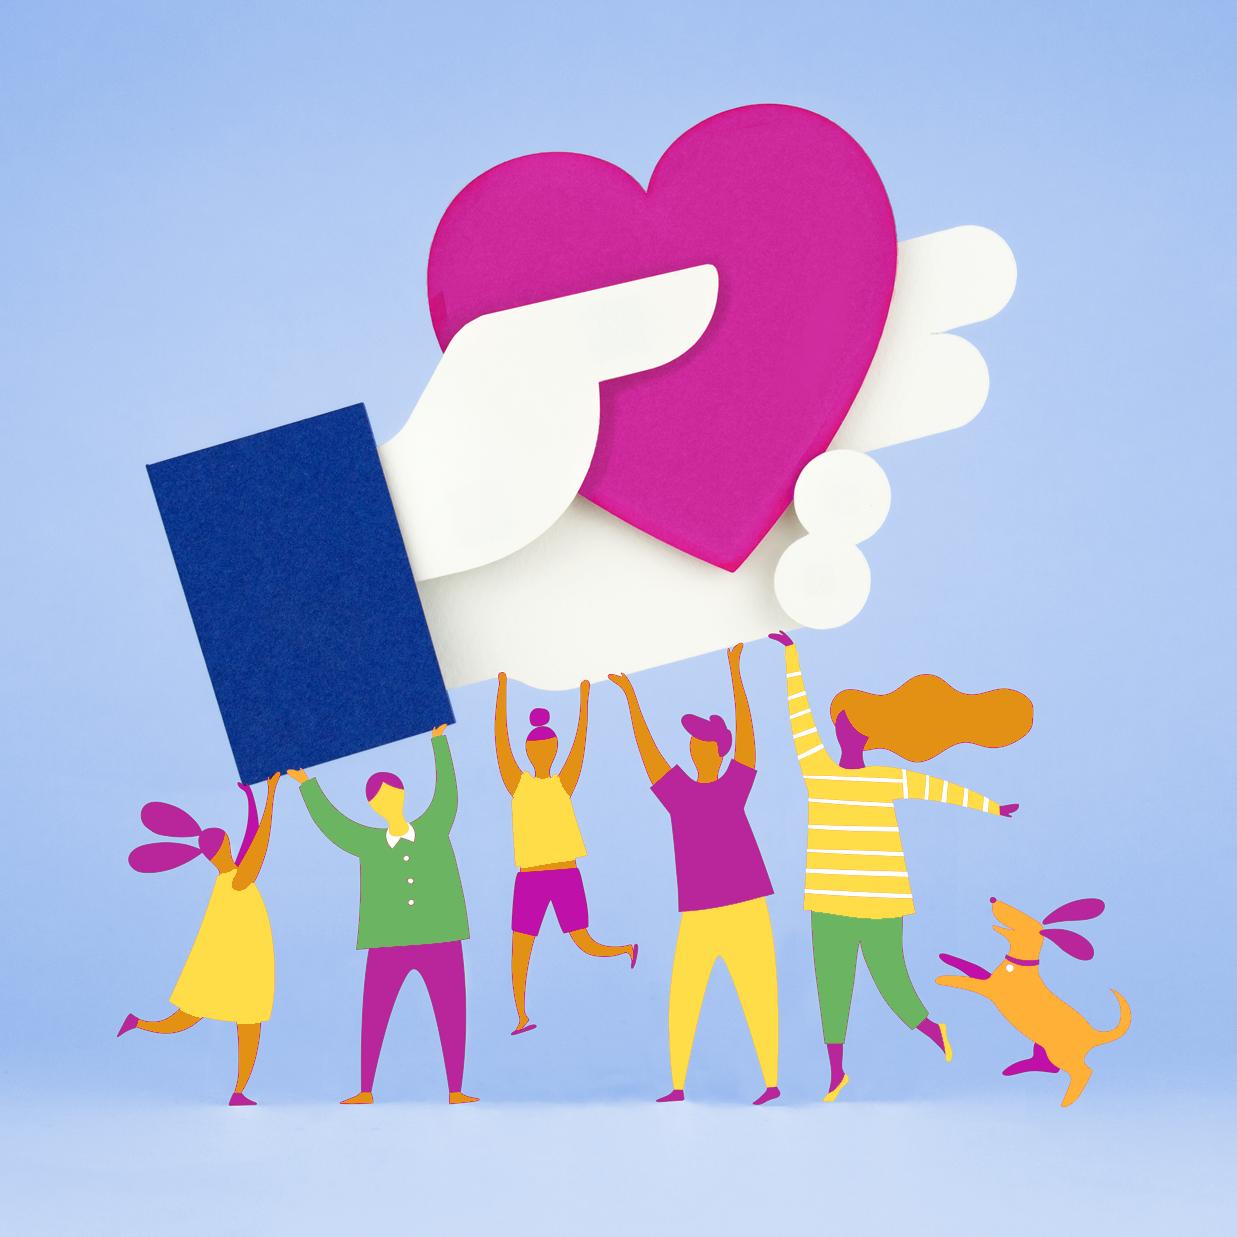 Facebook Fundraiser for Breast Cancer Awareness